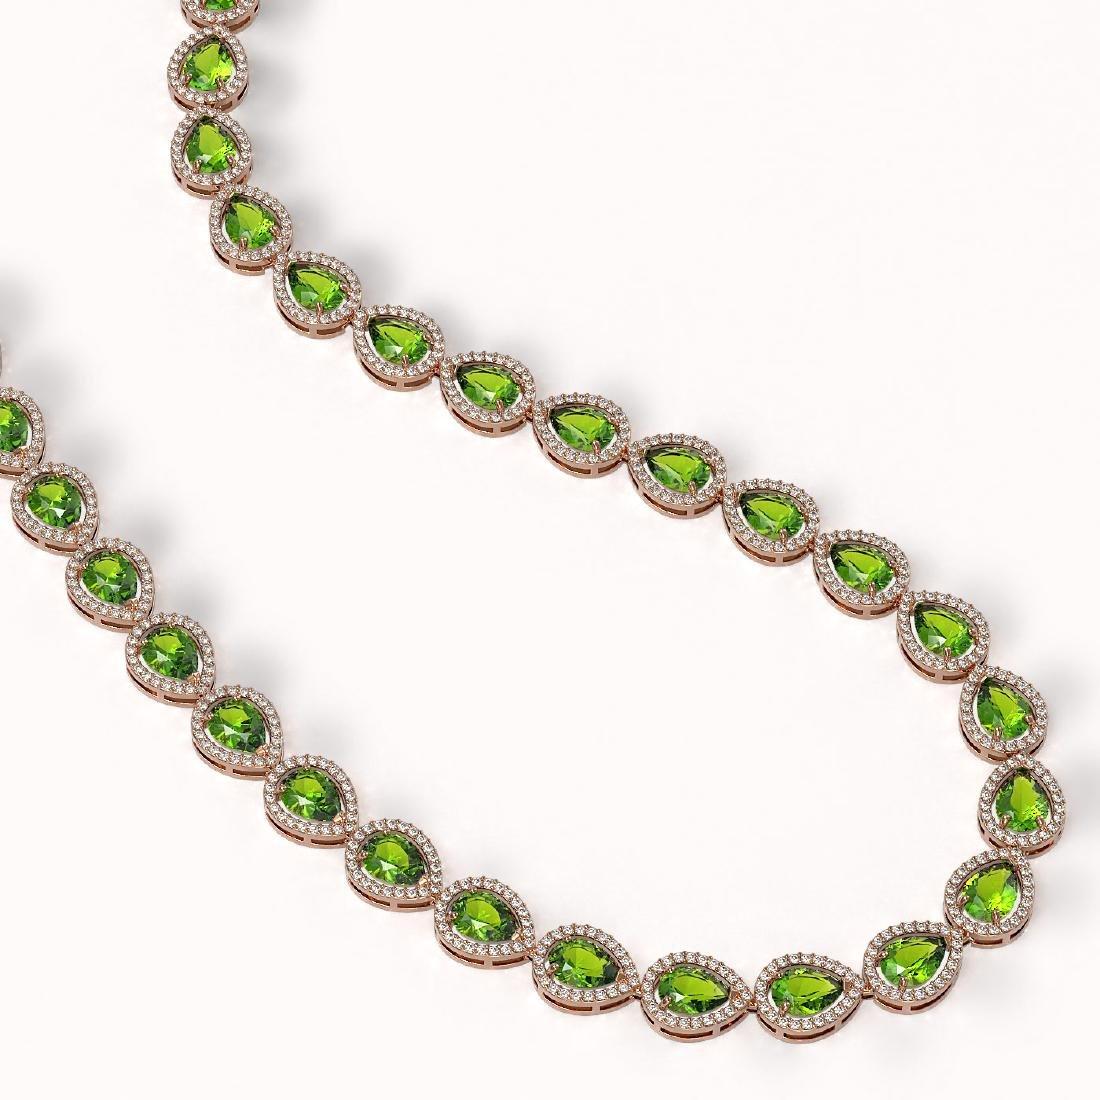 33.35 CTW Peridot & Diamond Halo Necklace 10K Rose Gold - 2